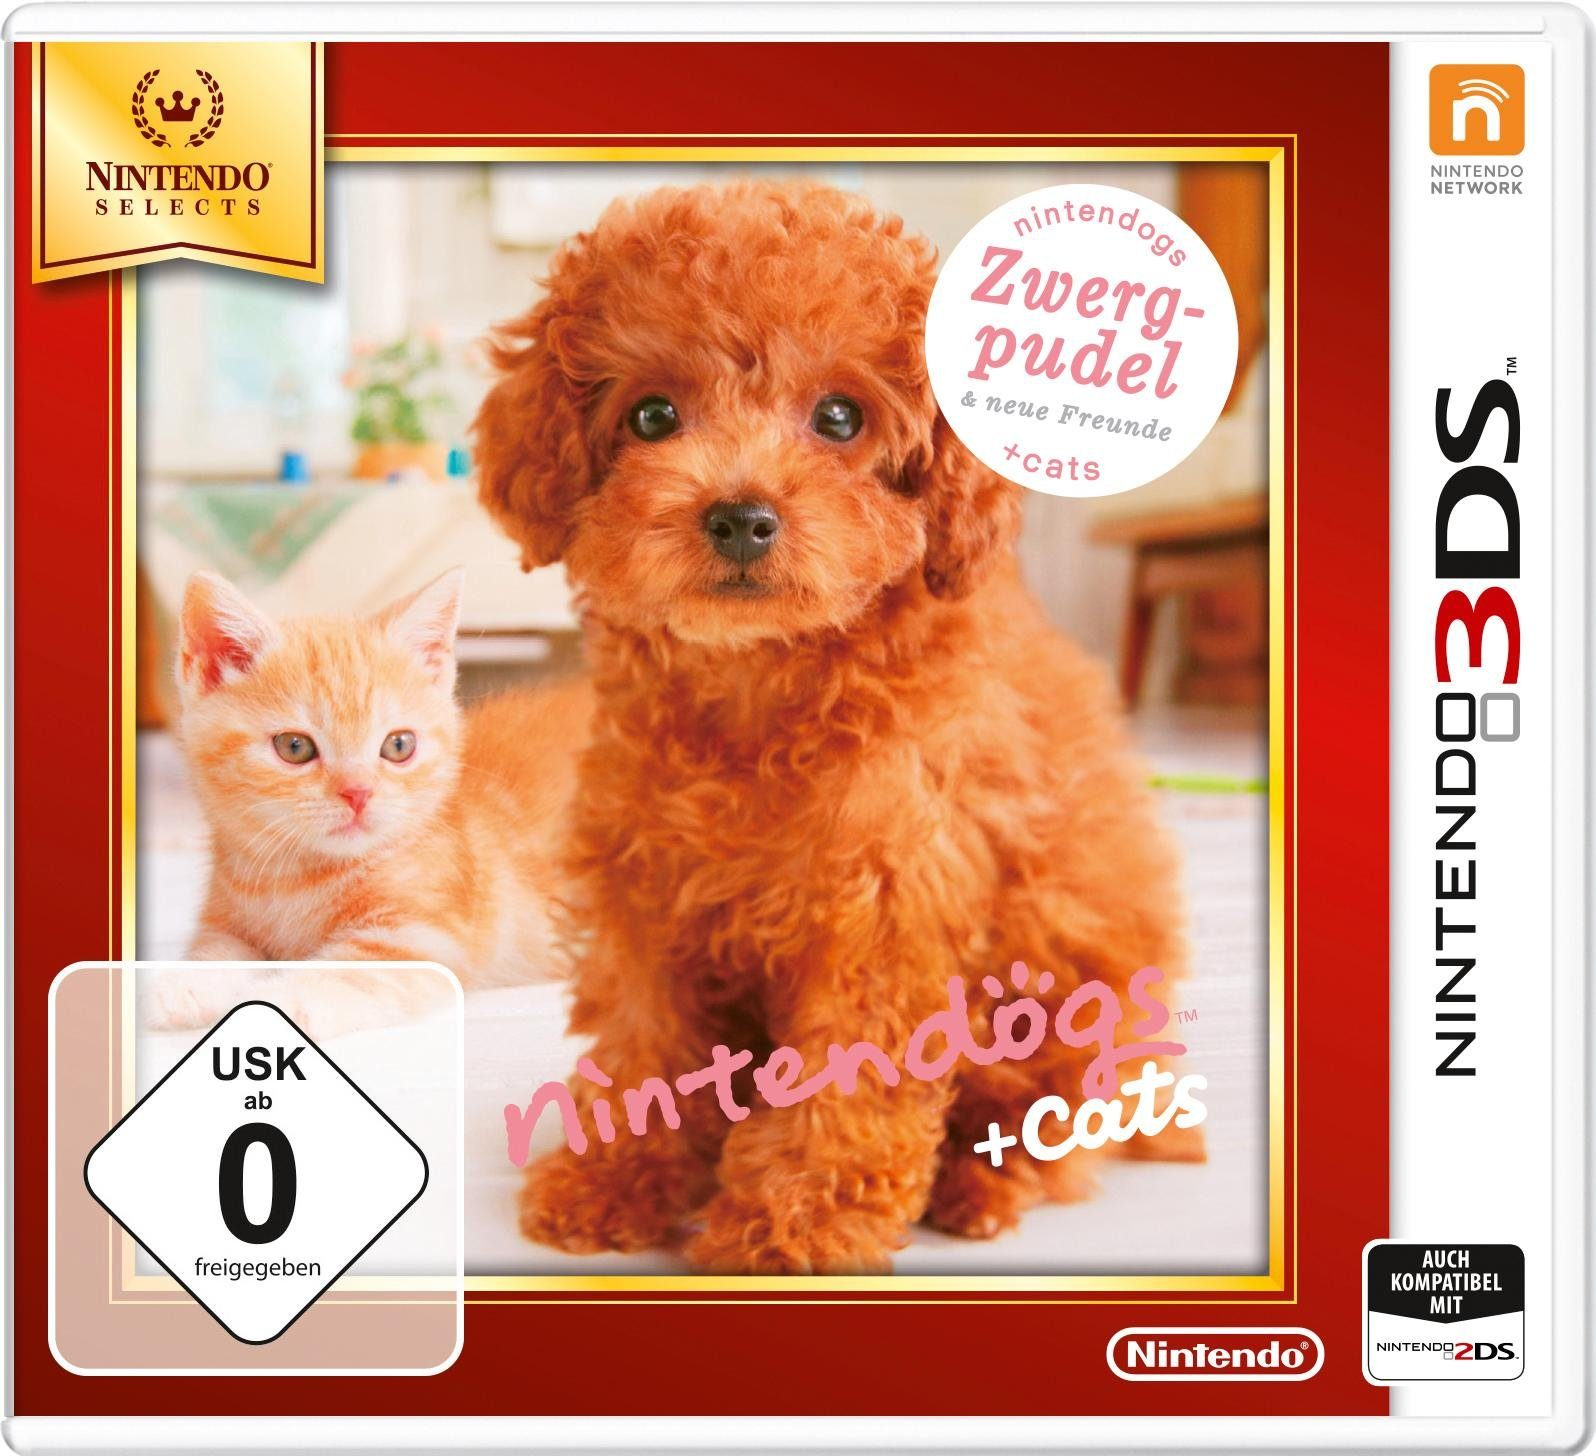 Nintendogs + Cats Zwergpudel & neue Freunde Nintendo Selects 3DS